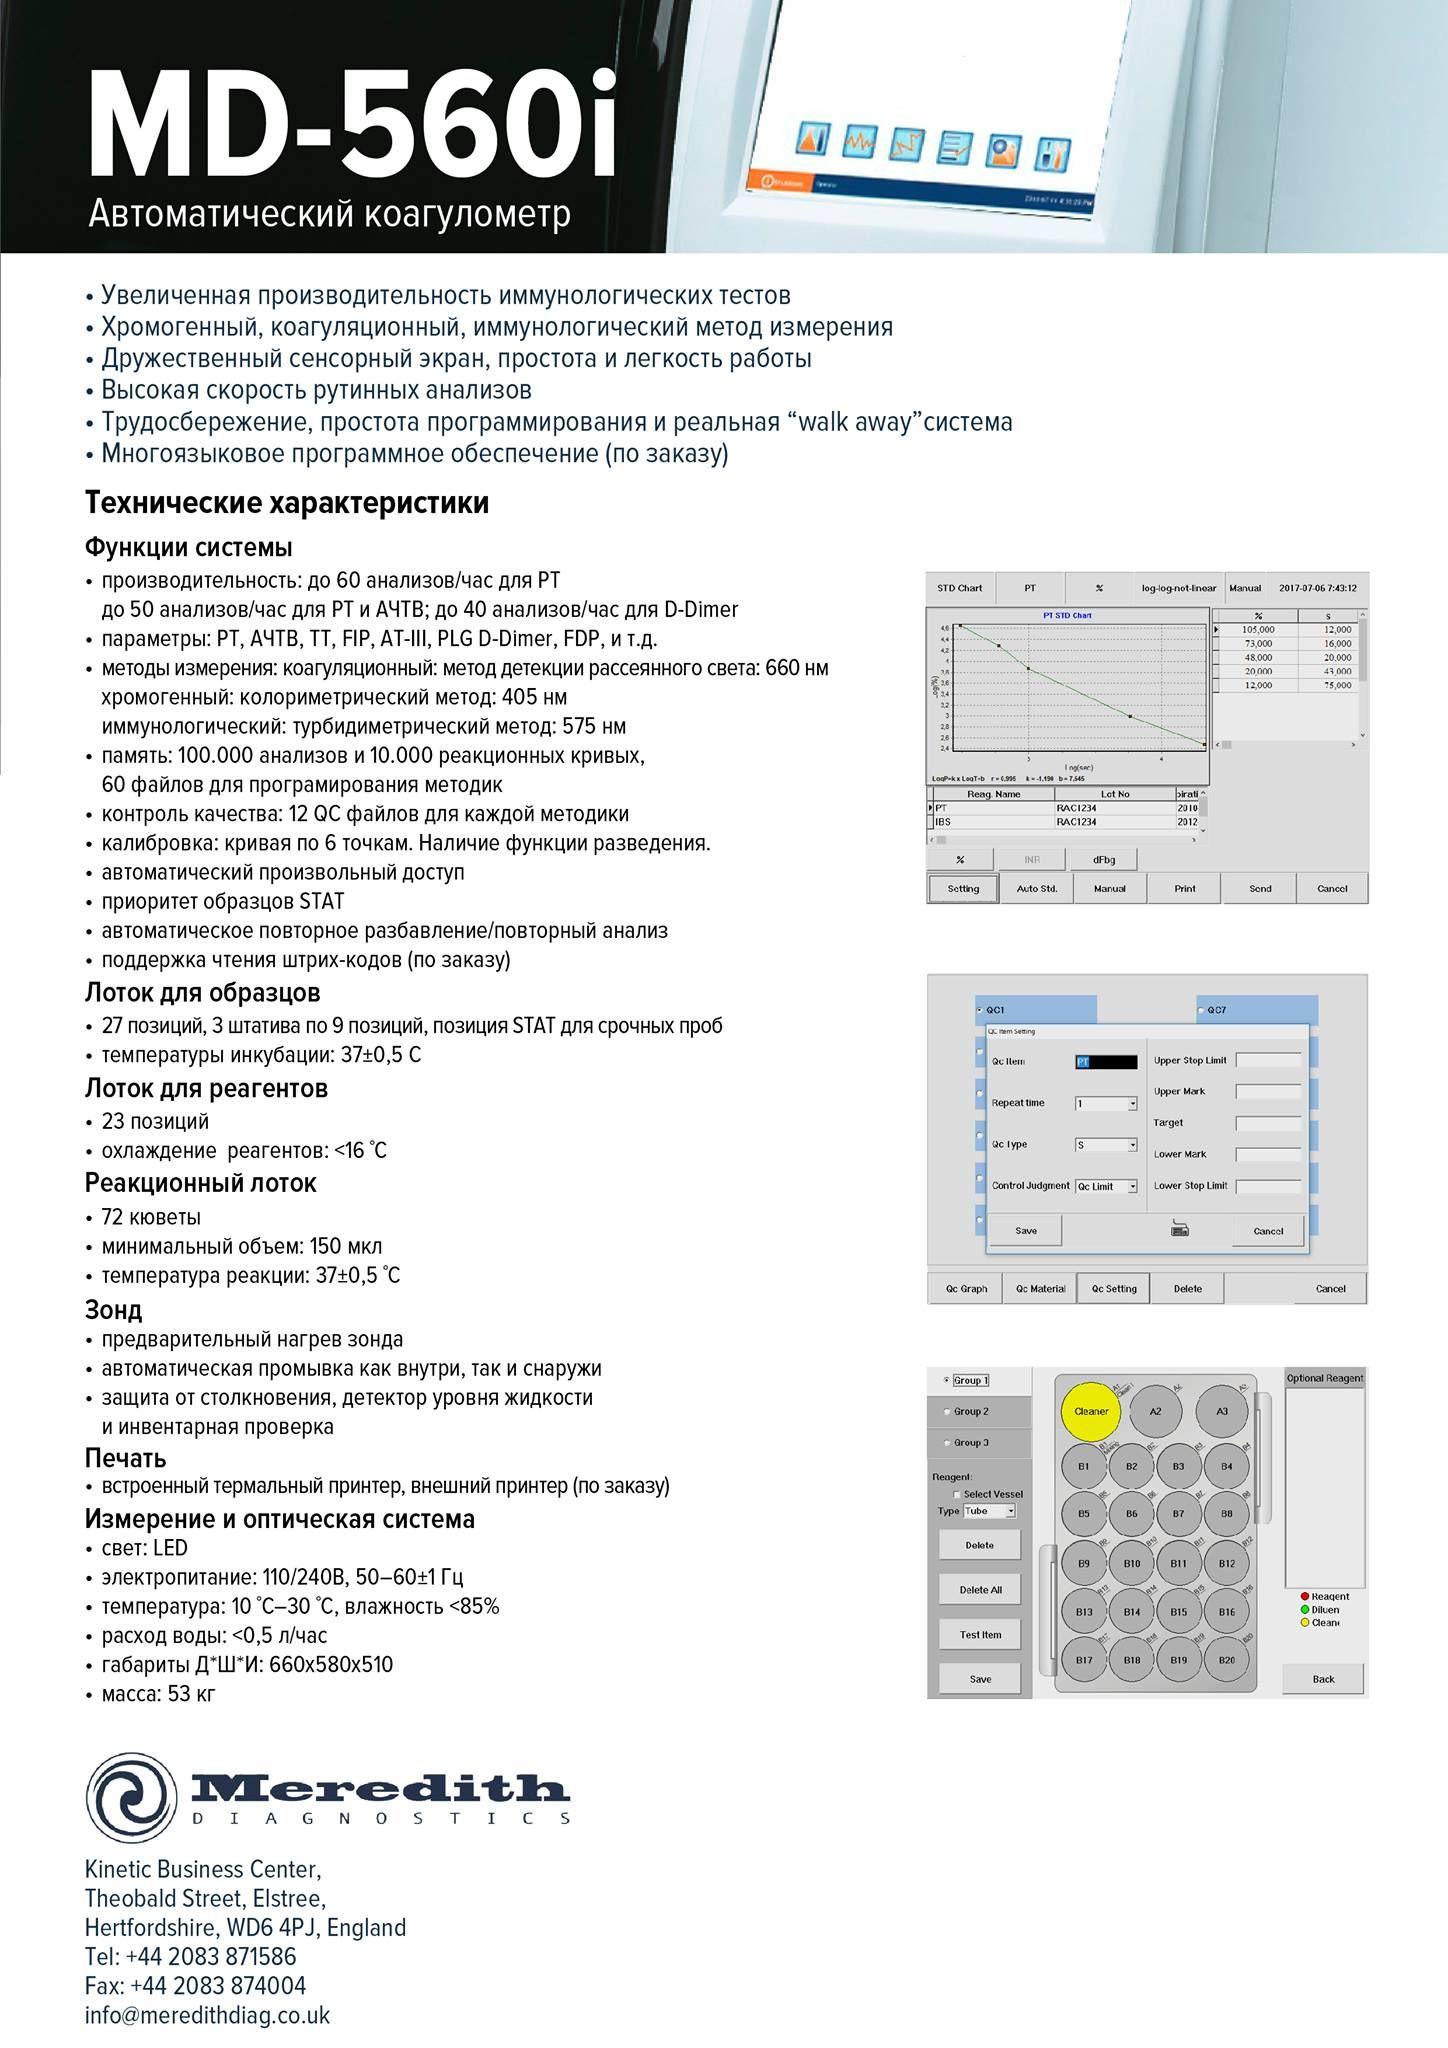 Автоматический коагулометр MD-560i